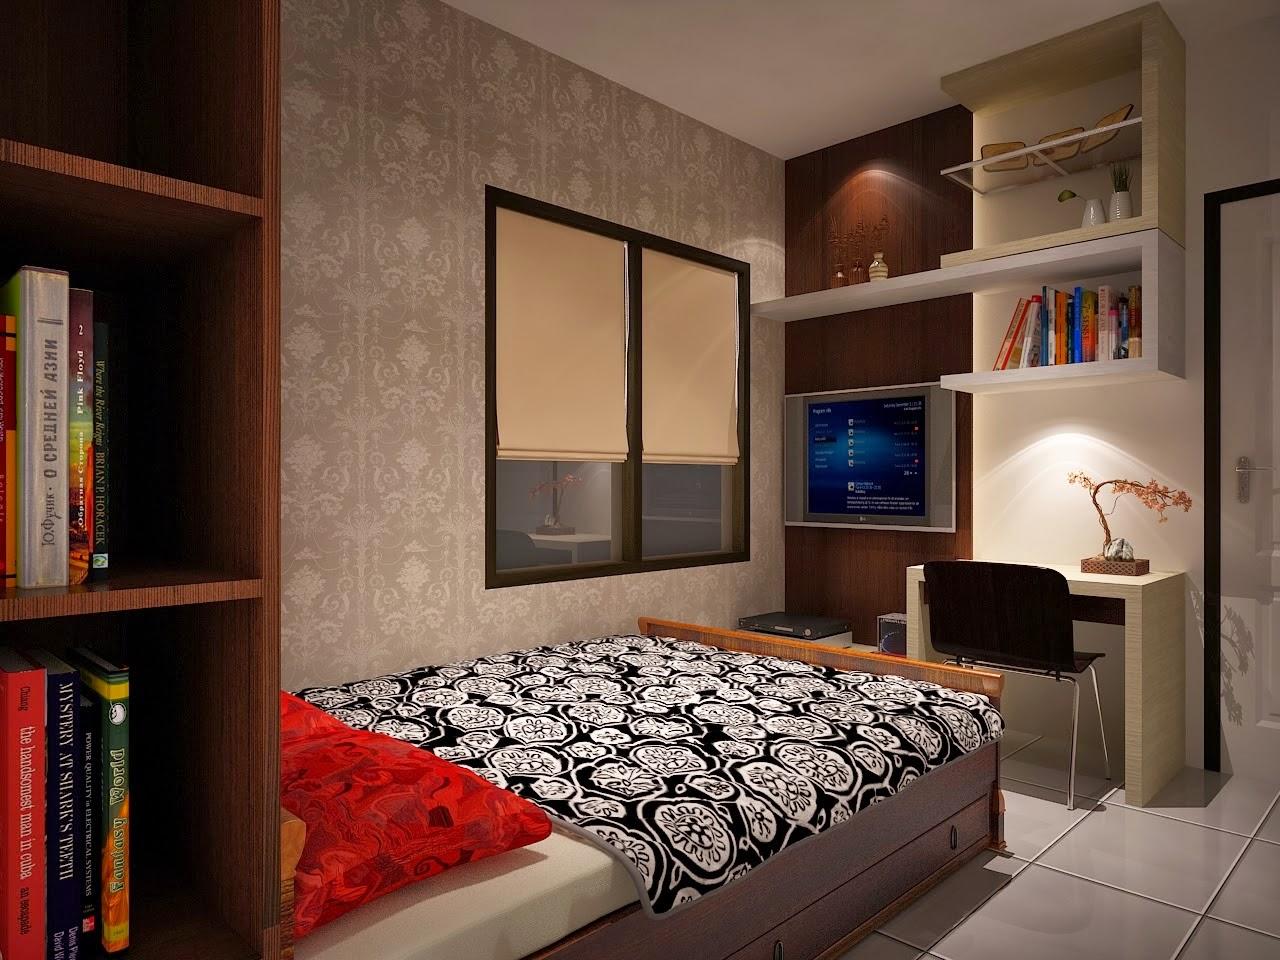 Apartemen Jarrdin Bandung - Apartemen dan Hotel di Bandung